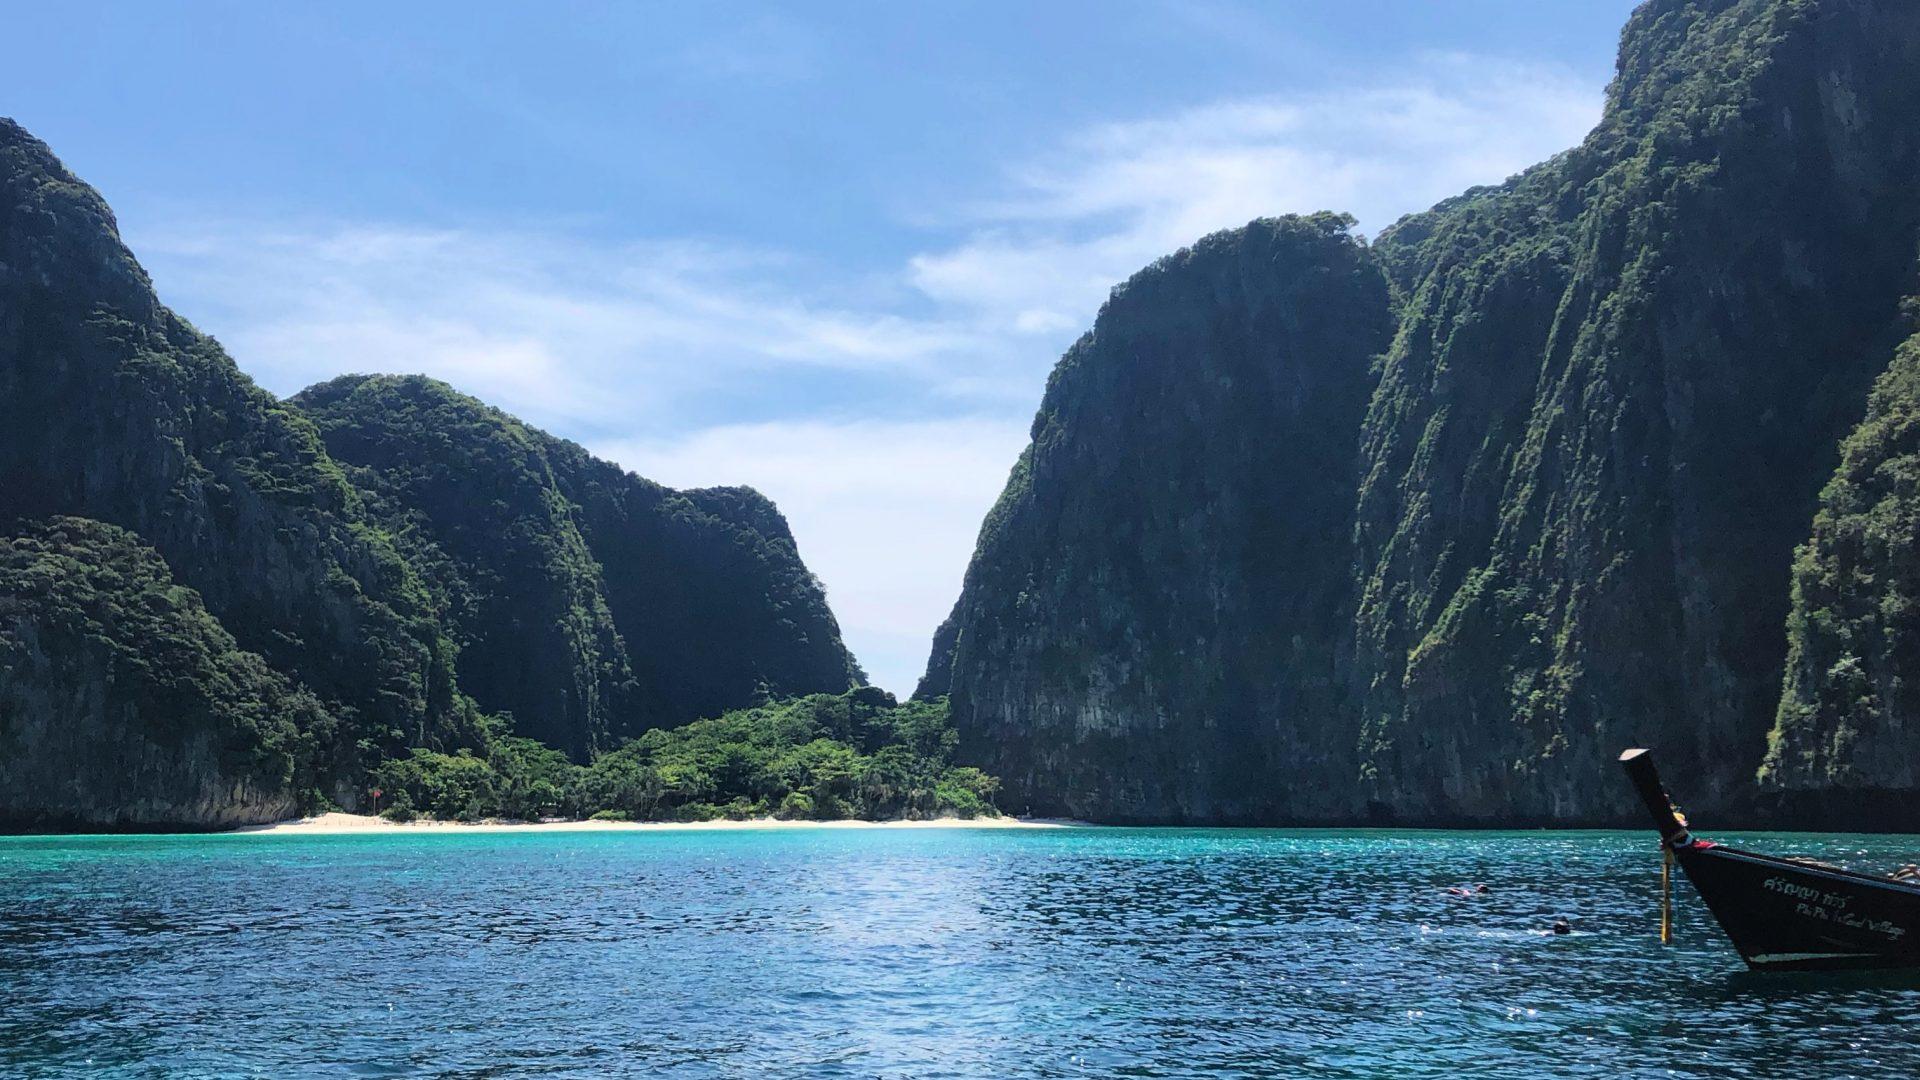 Sawadee kha (Hallo) schönes Thailand!